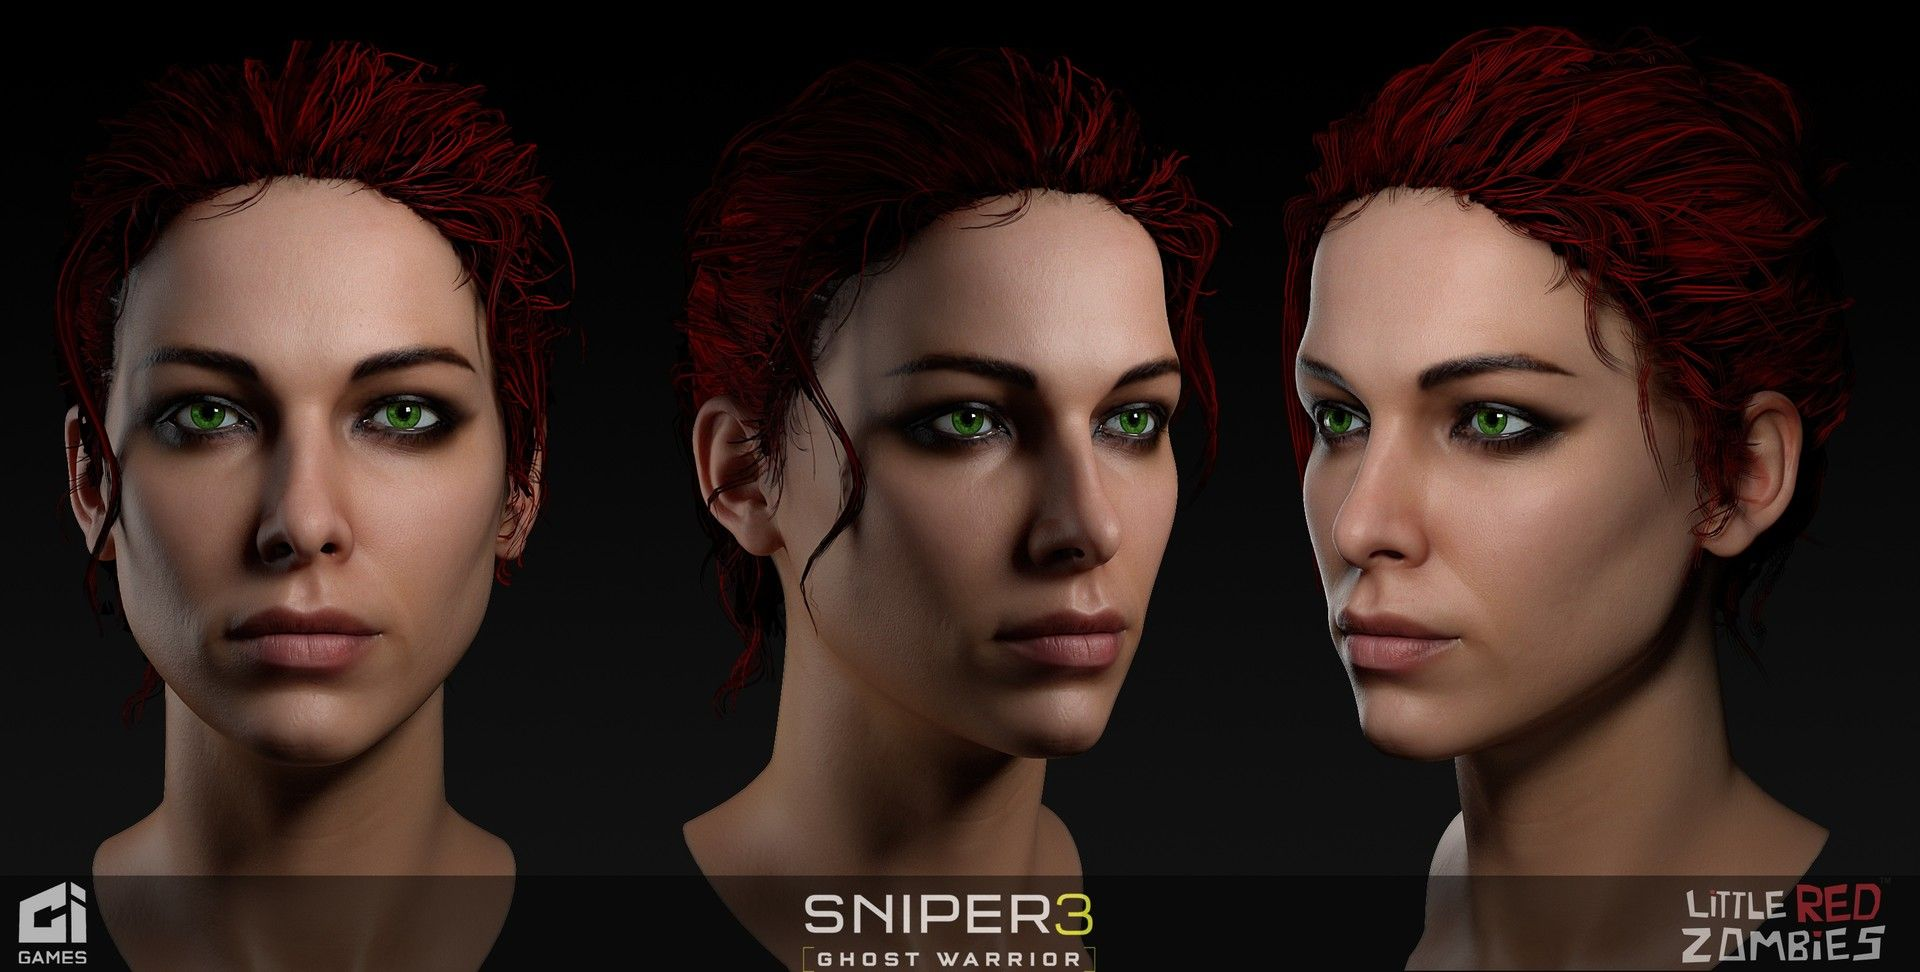 ArtStation - Sniper Ghost Warrior 3 Character - Raquel, LITTLE RED ZOMBIES